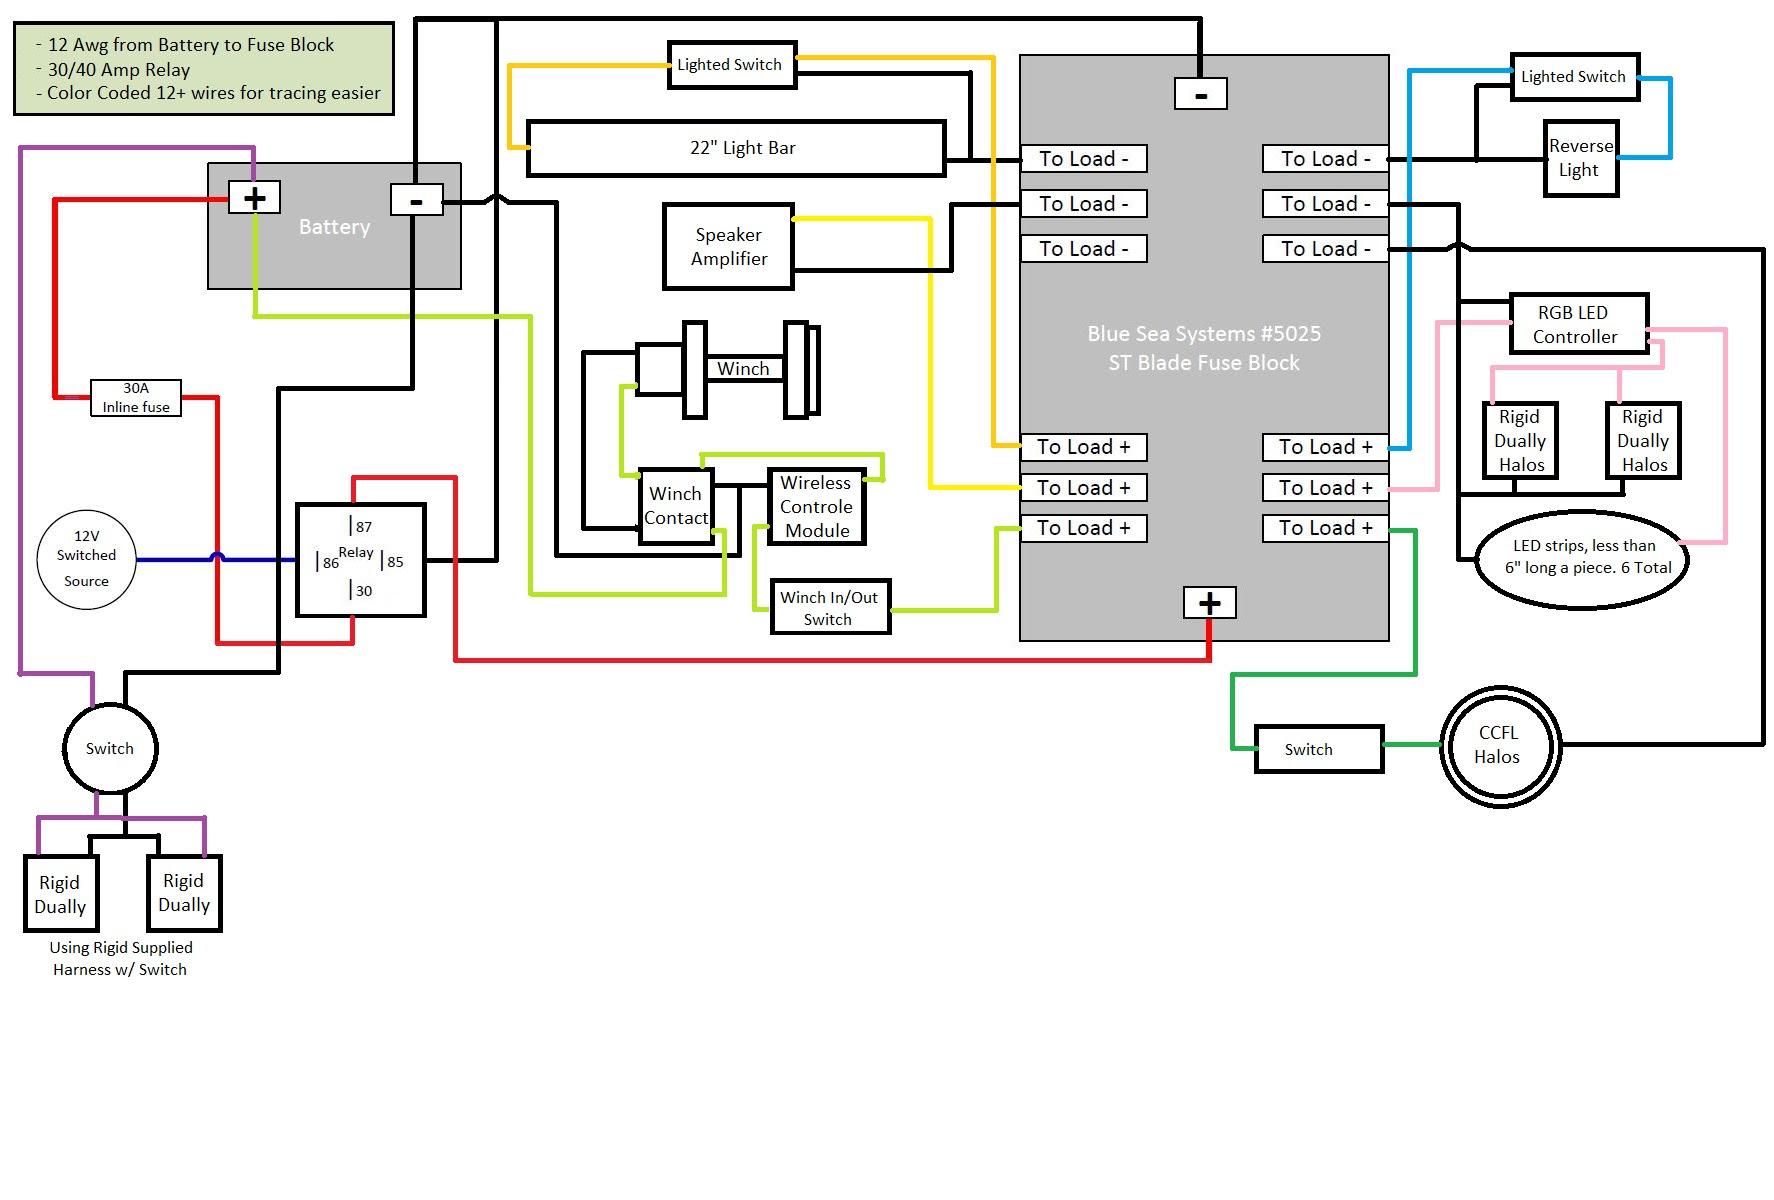 Diagram 2004 Yamaha Grizzly Wiring Diagram Full Version Hd Quality Wiring Diagram Tabletodiagram Edelynetaxi Fr